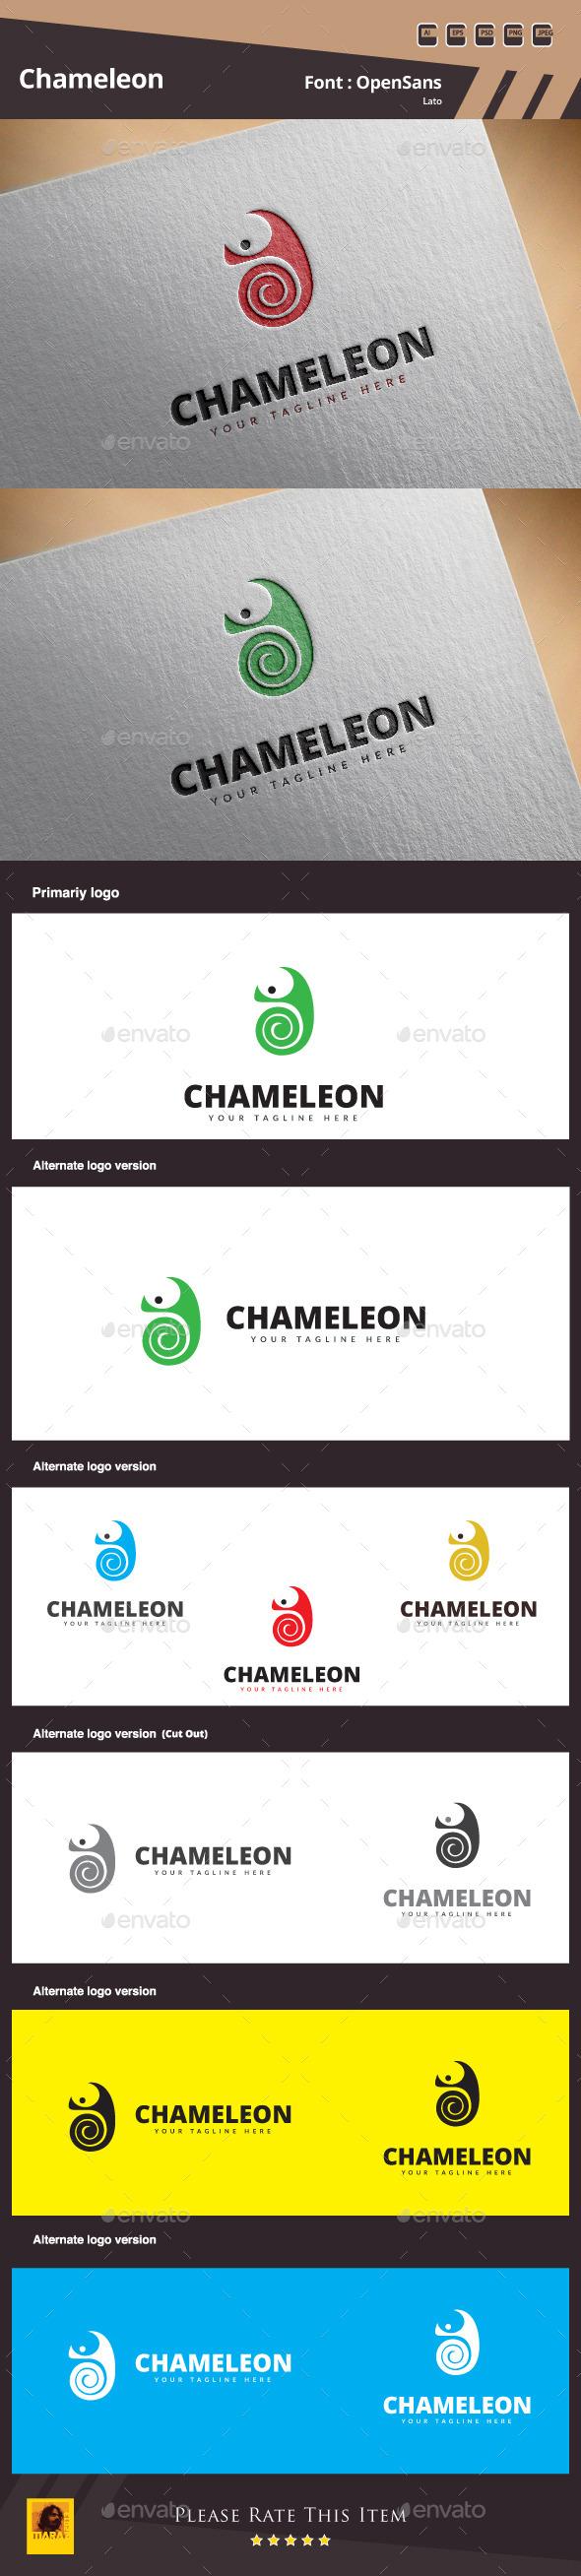 GraphicRiver Chameleon Logo Template 11050461